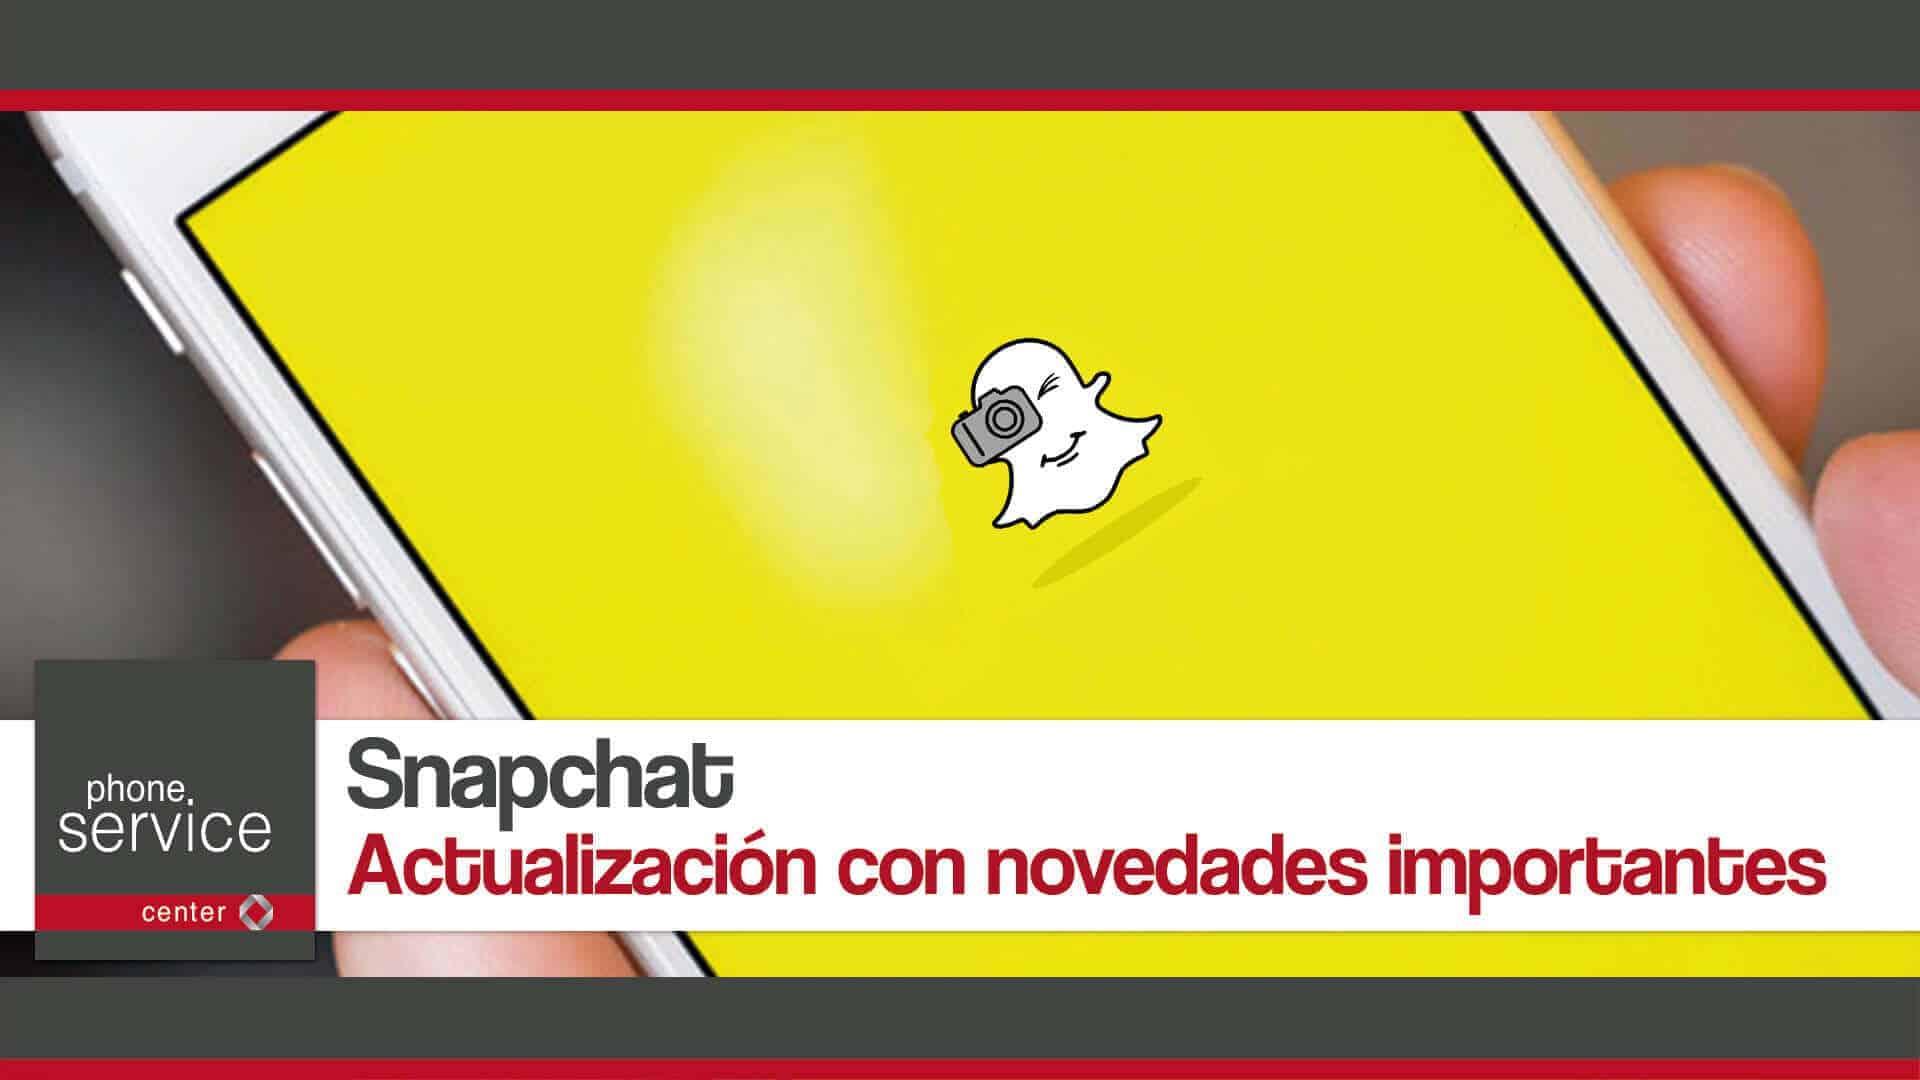 Snapchat actualizacion con novedades importantes